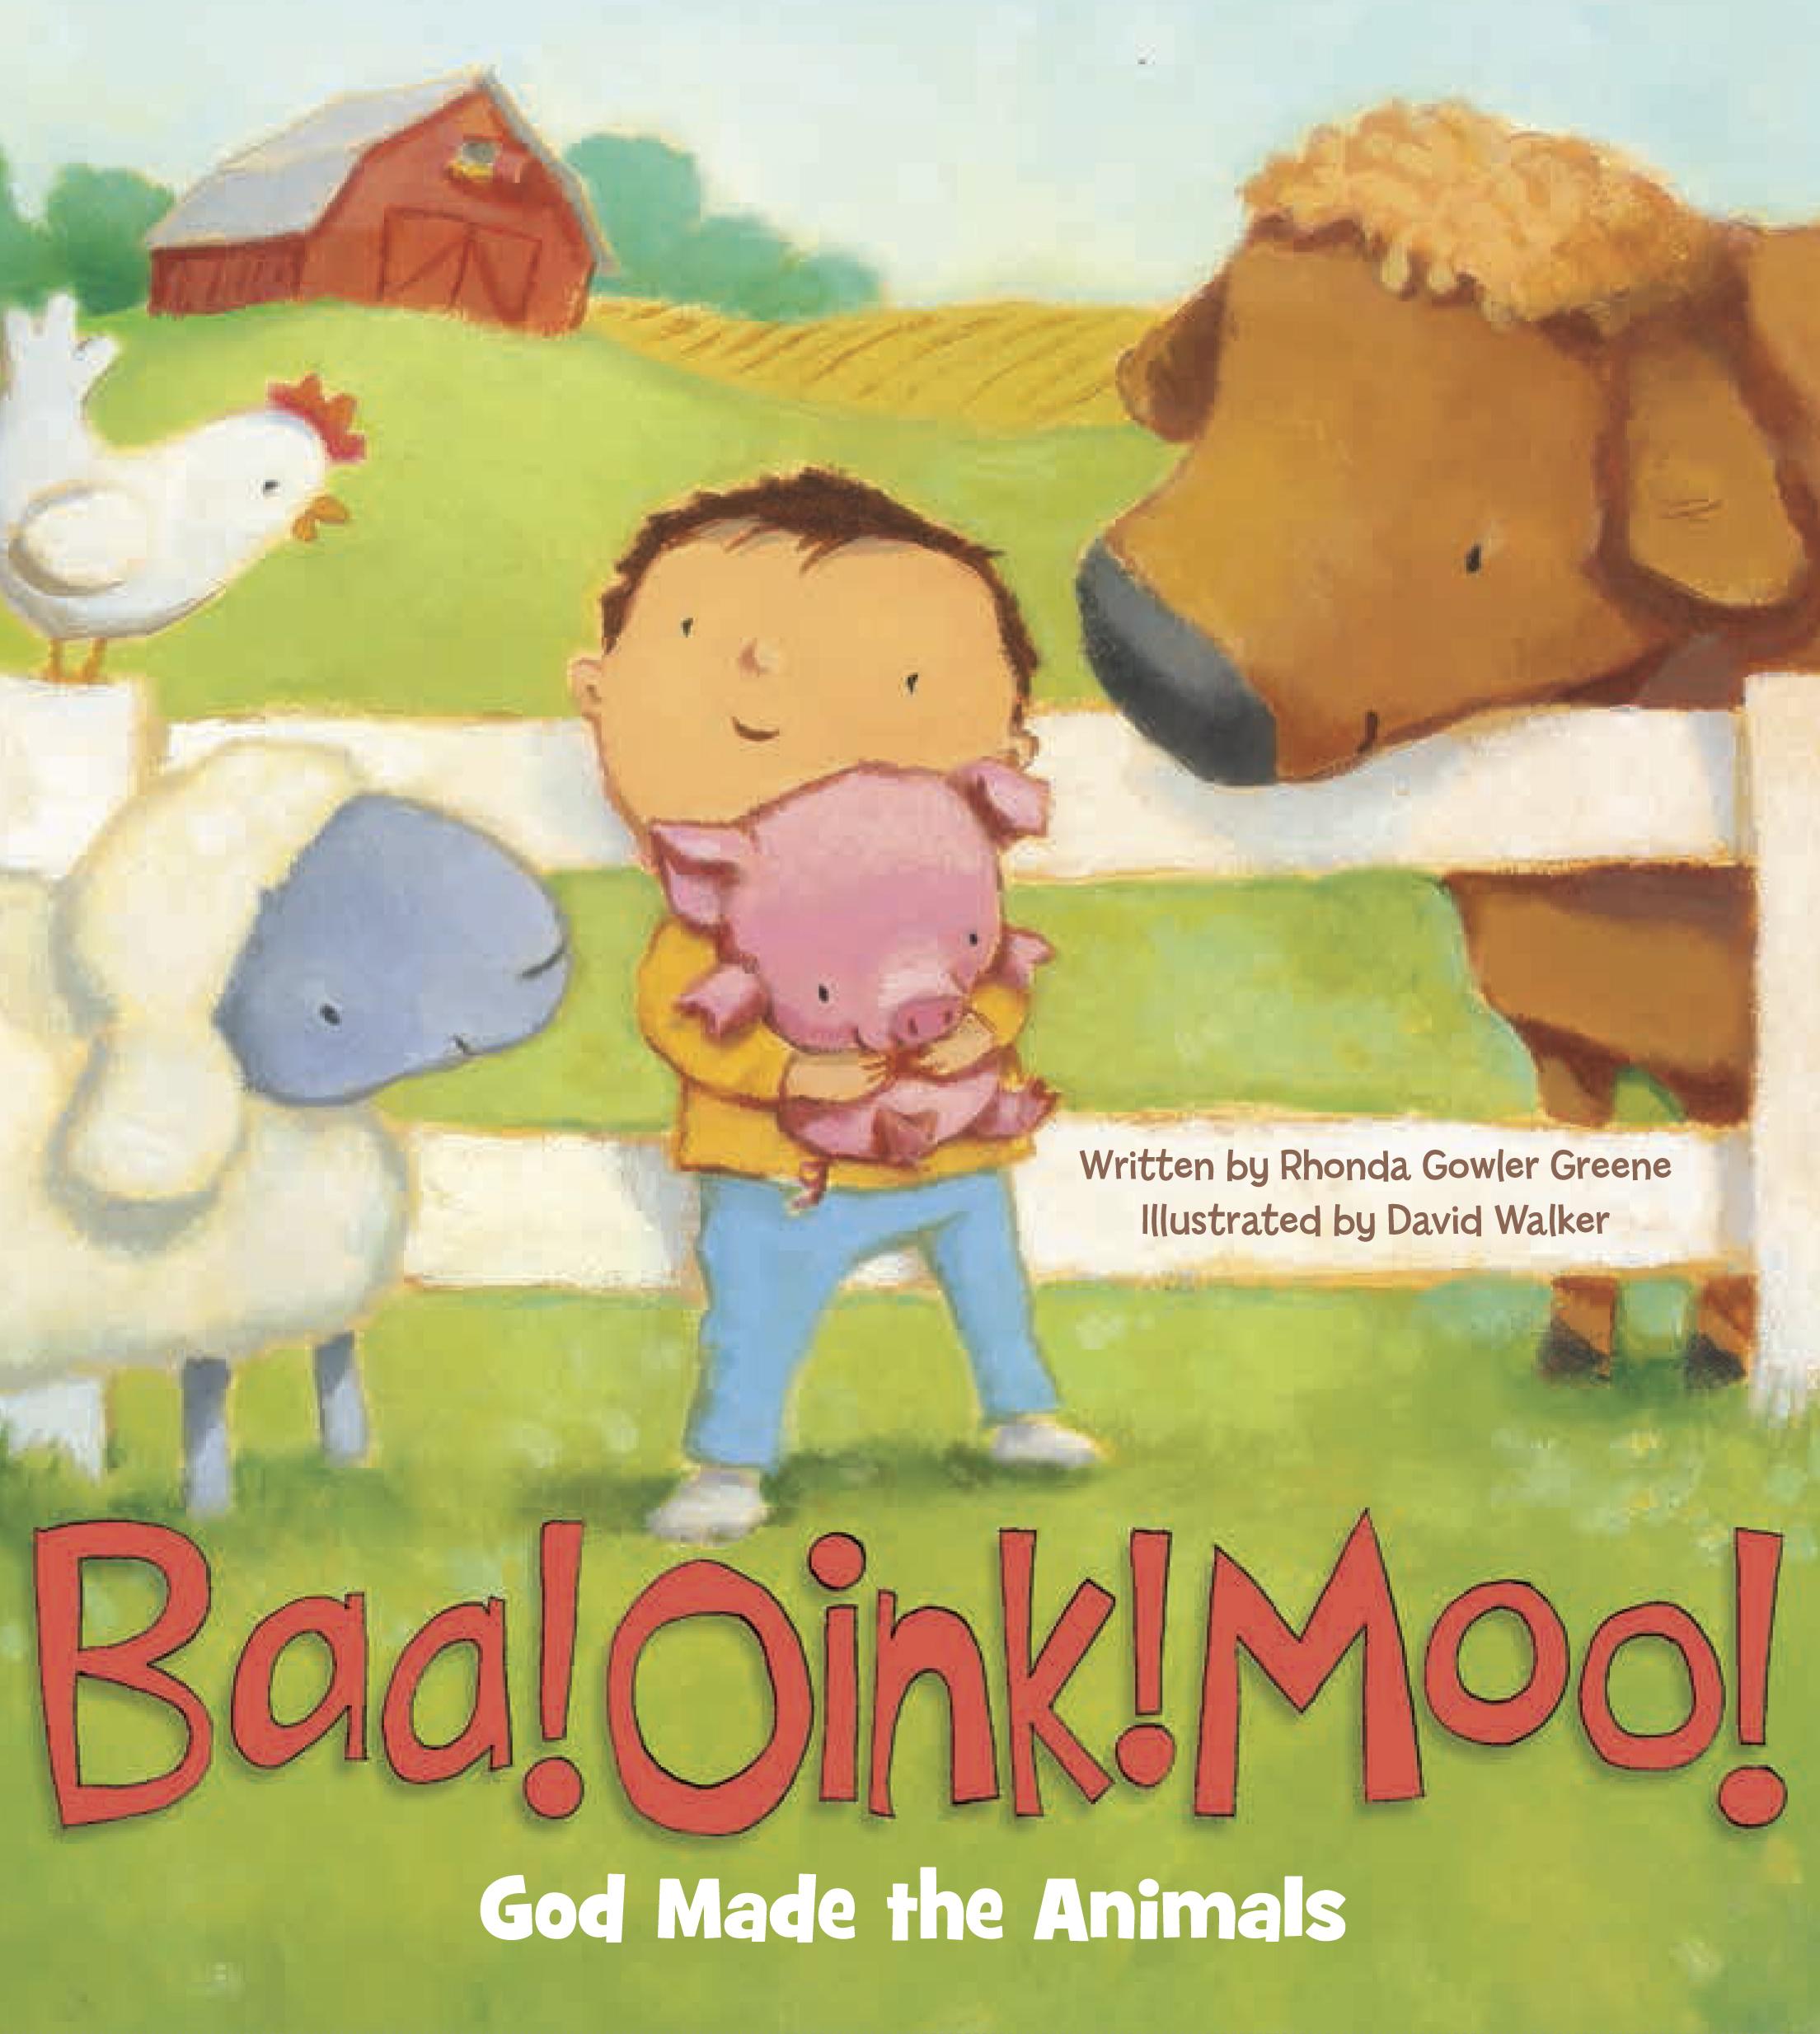 ZonderKidz ISBN 978-0-310-75227-1 (board book) ebook edition